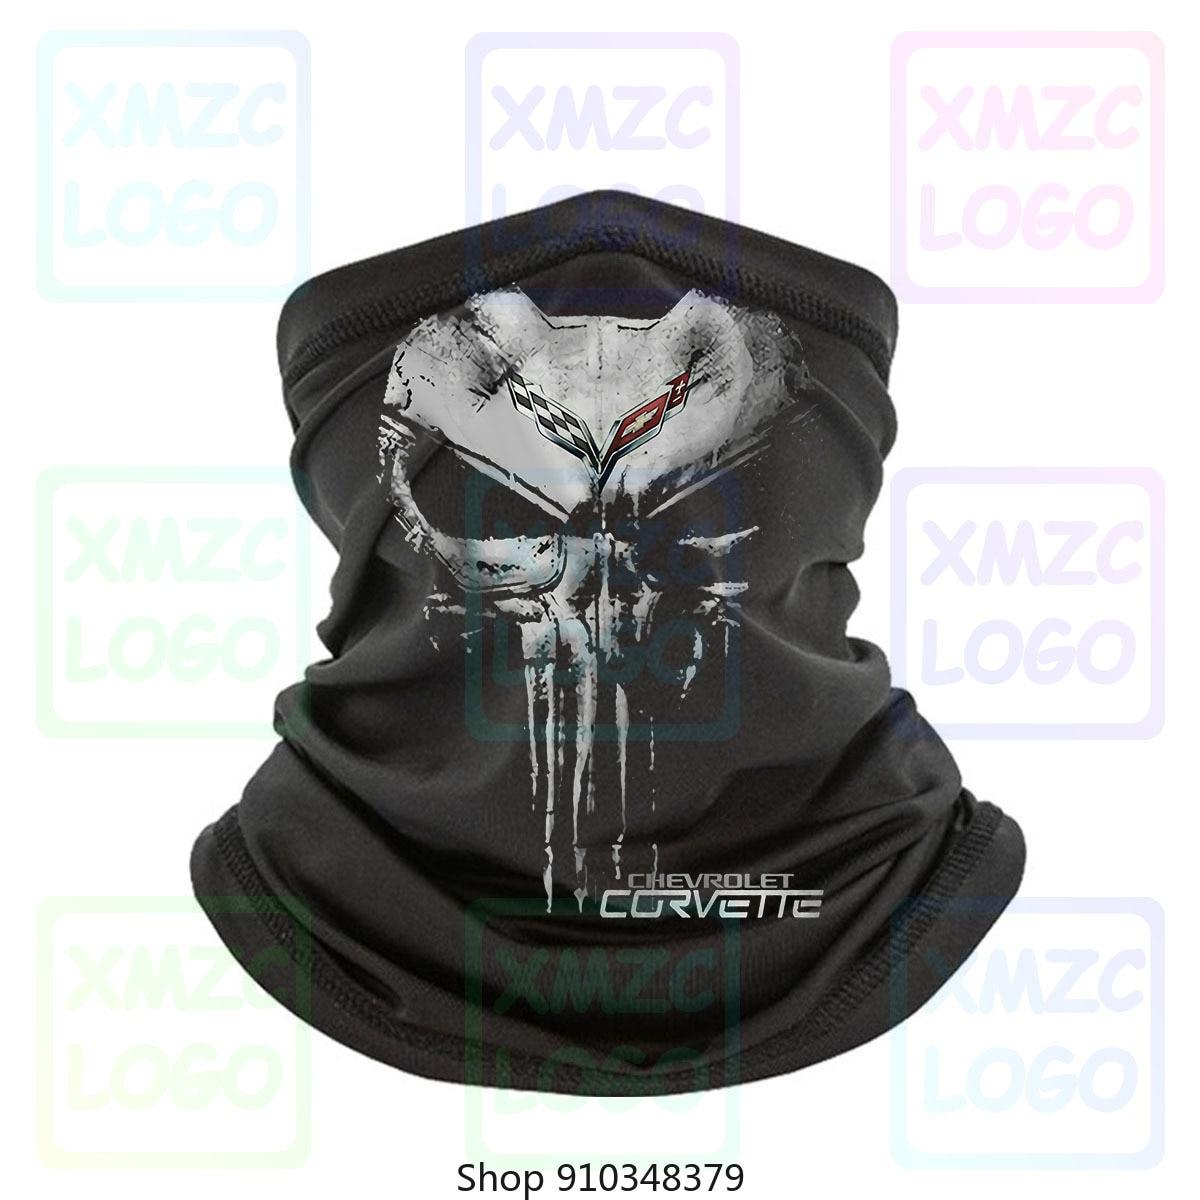 Corvette C7 C6 C5 C4 C3 C2 C1 Z06 Zr1 Bandana de hombre de algodón negro de tamaño completo pañuelo Bandana calentador de cuello mujeres hombres